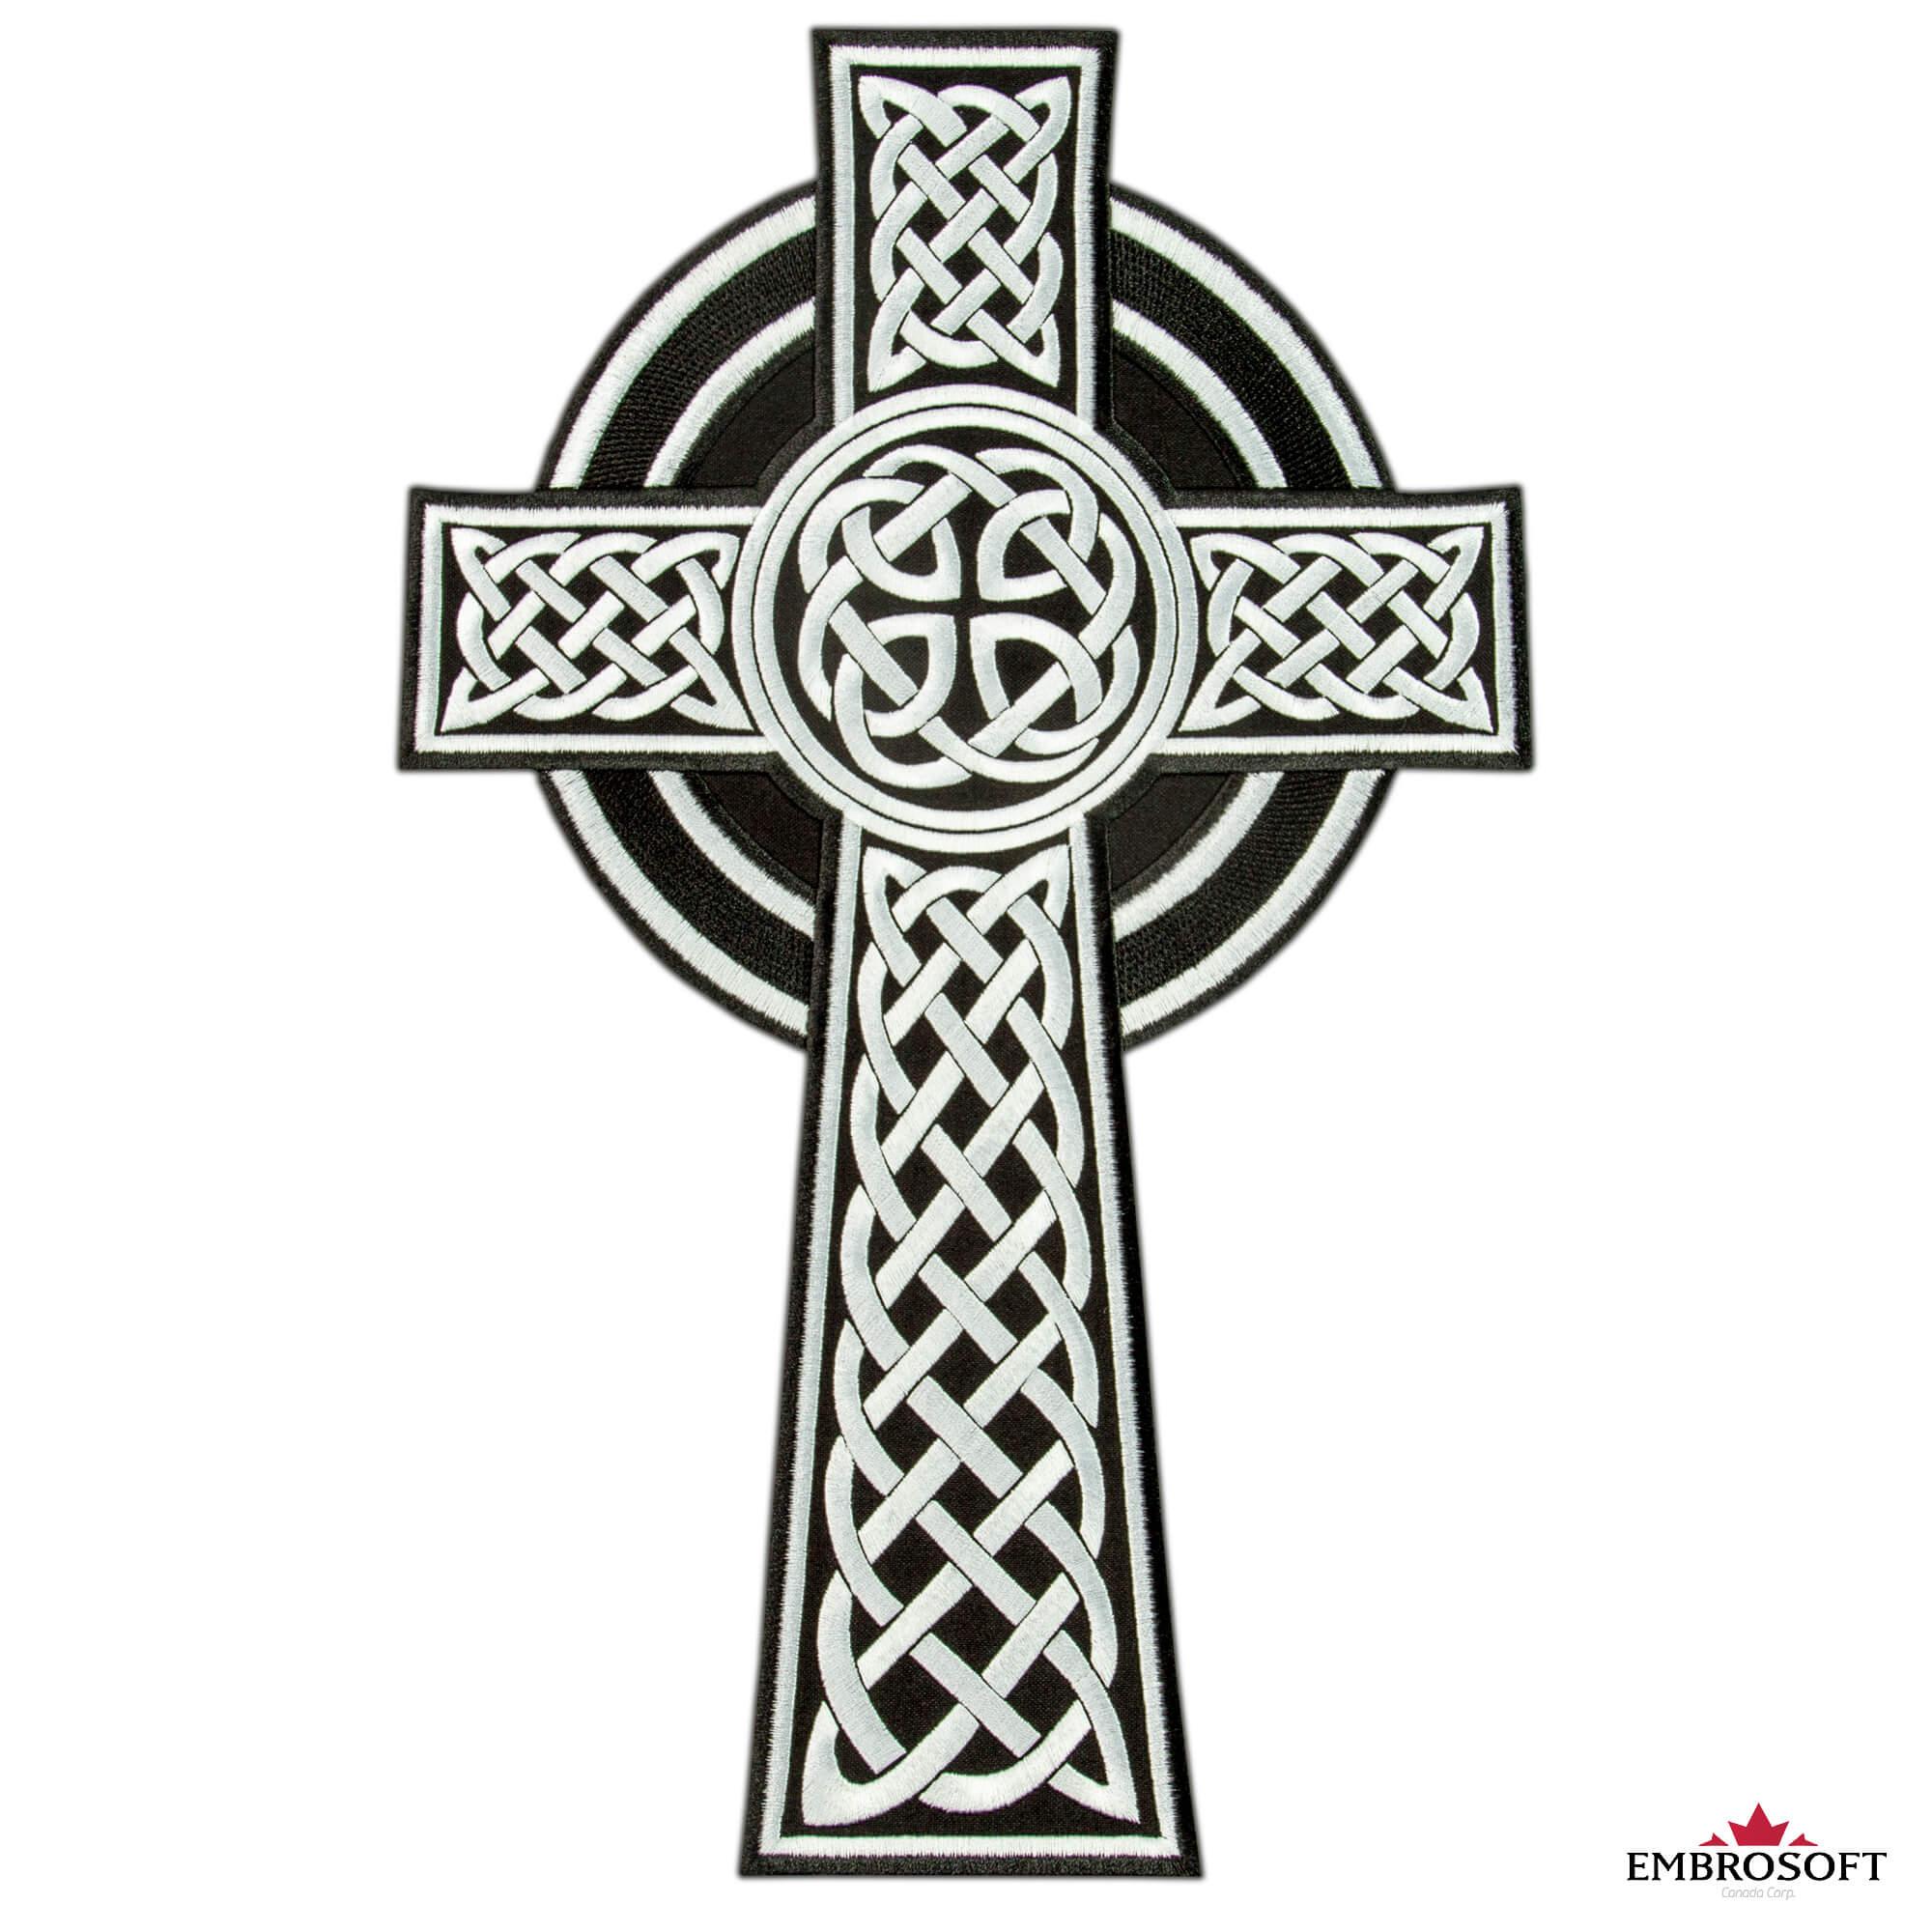 Celtic Cross Patch Religious Ethnic Emblem Embroidered Iron On 2 Sizes Embrosoft